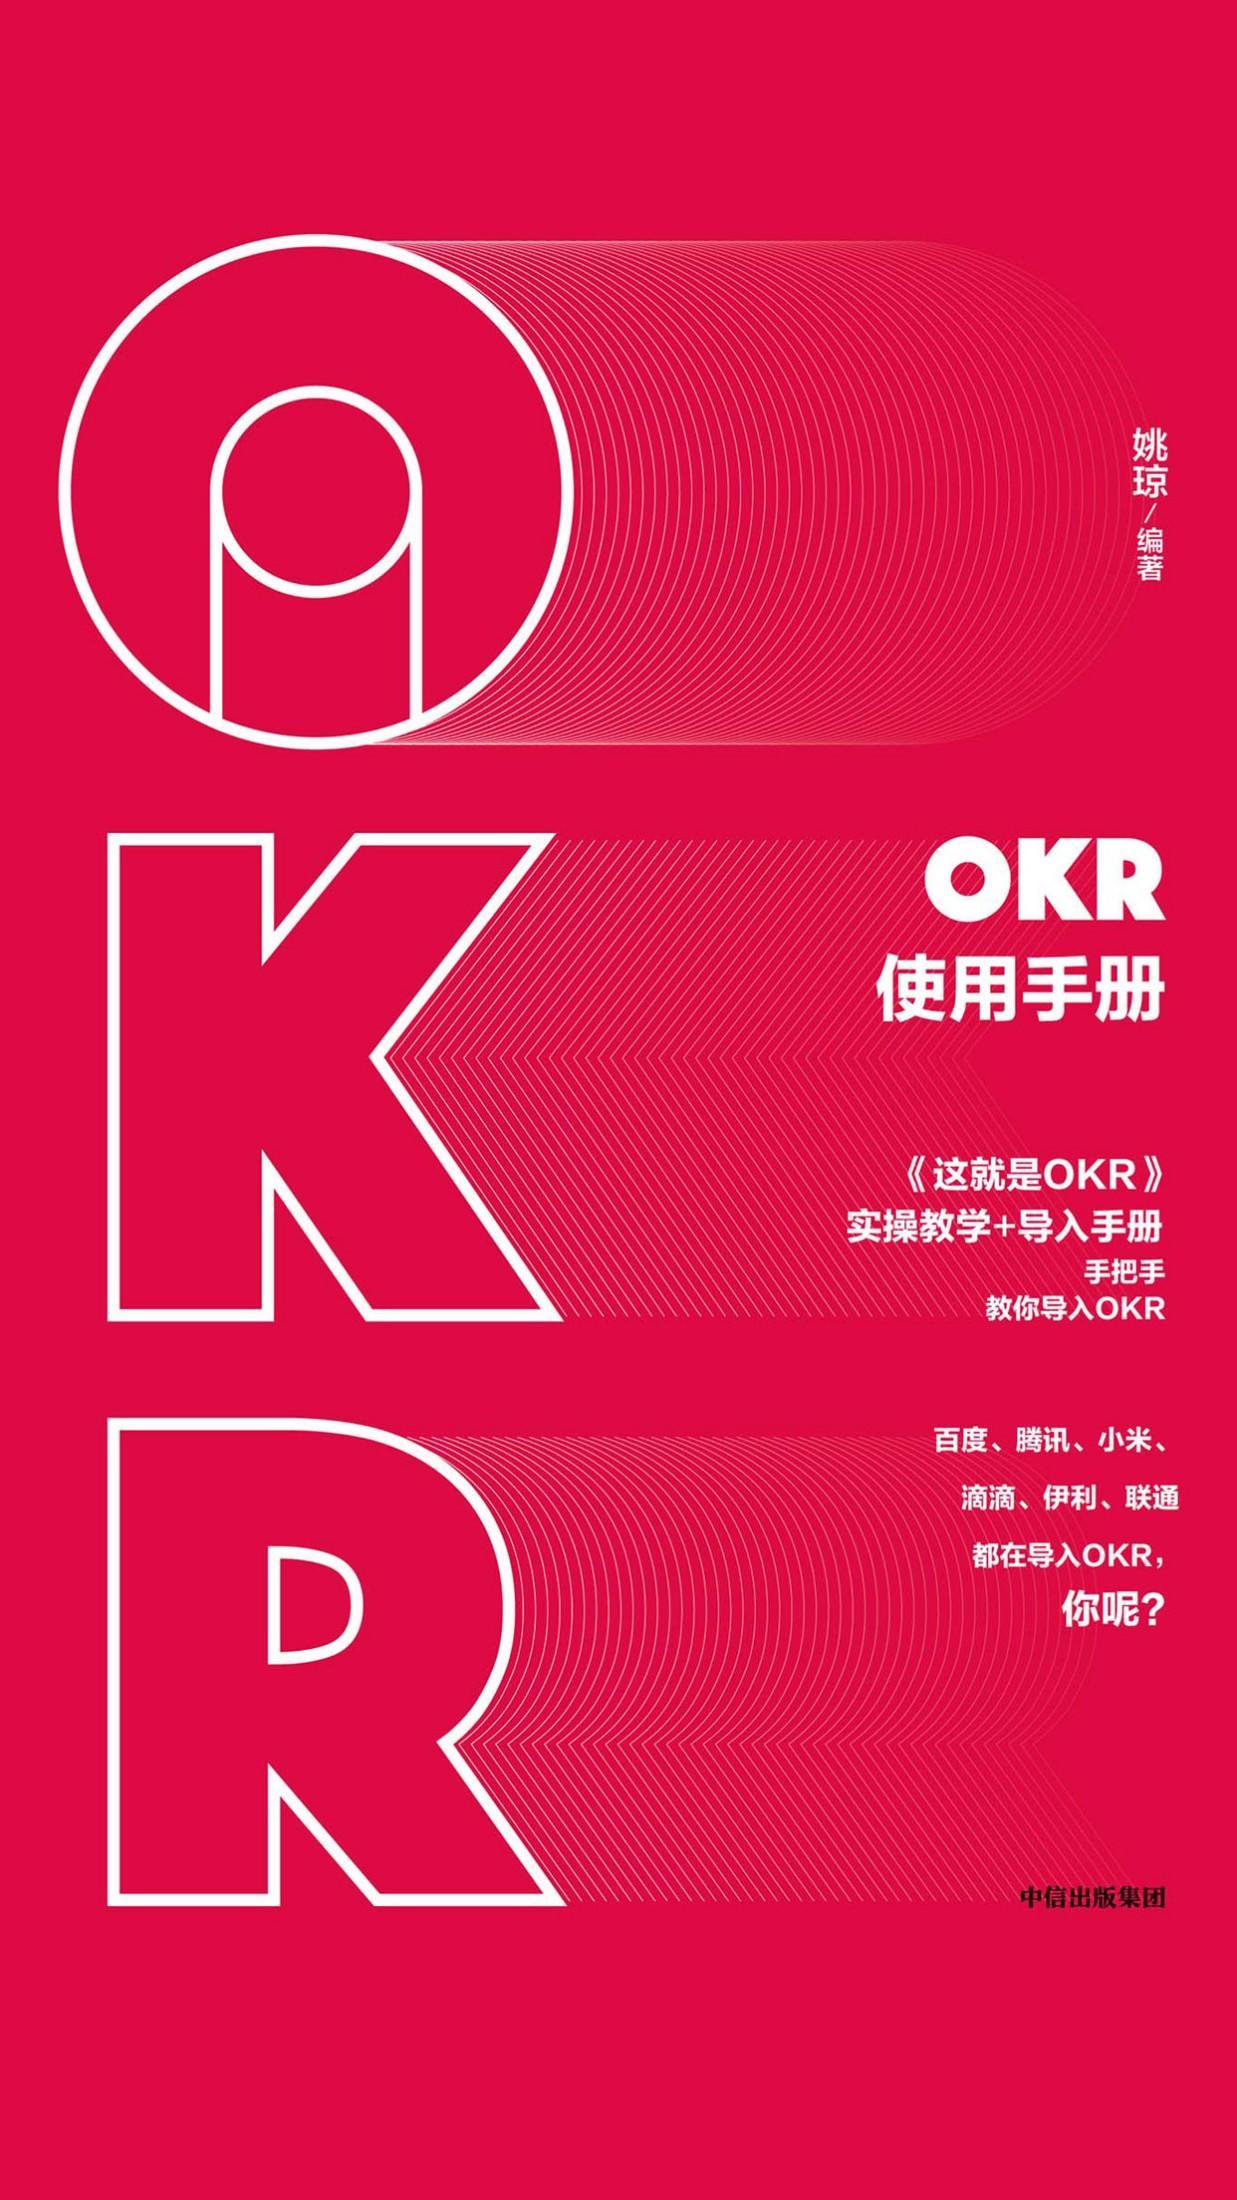 OKR使用手冊mobi